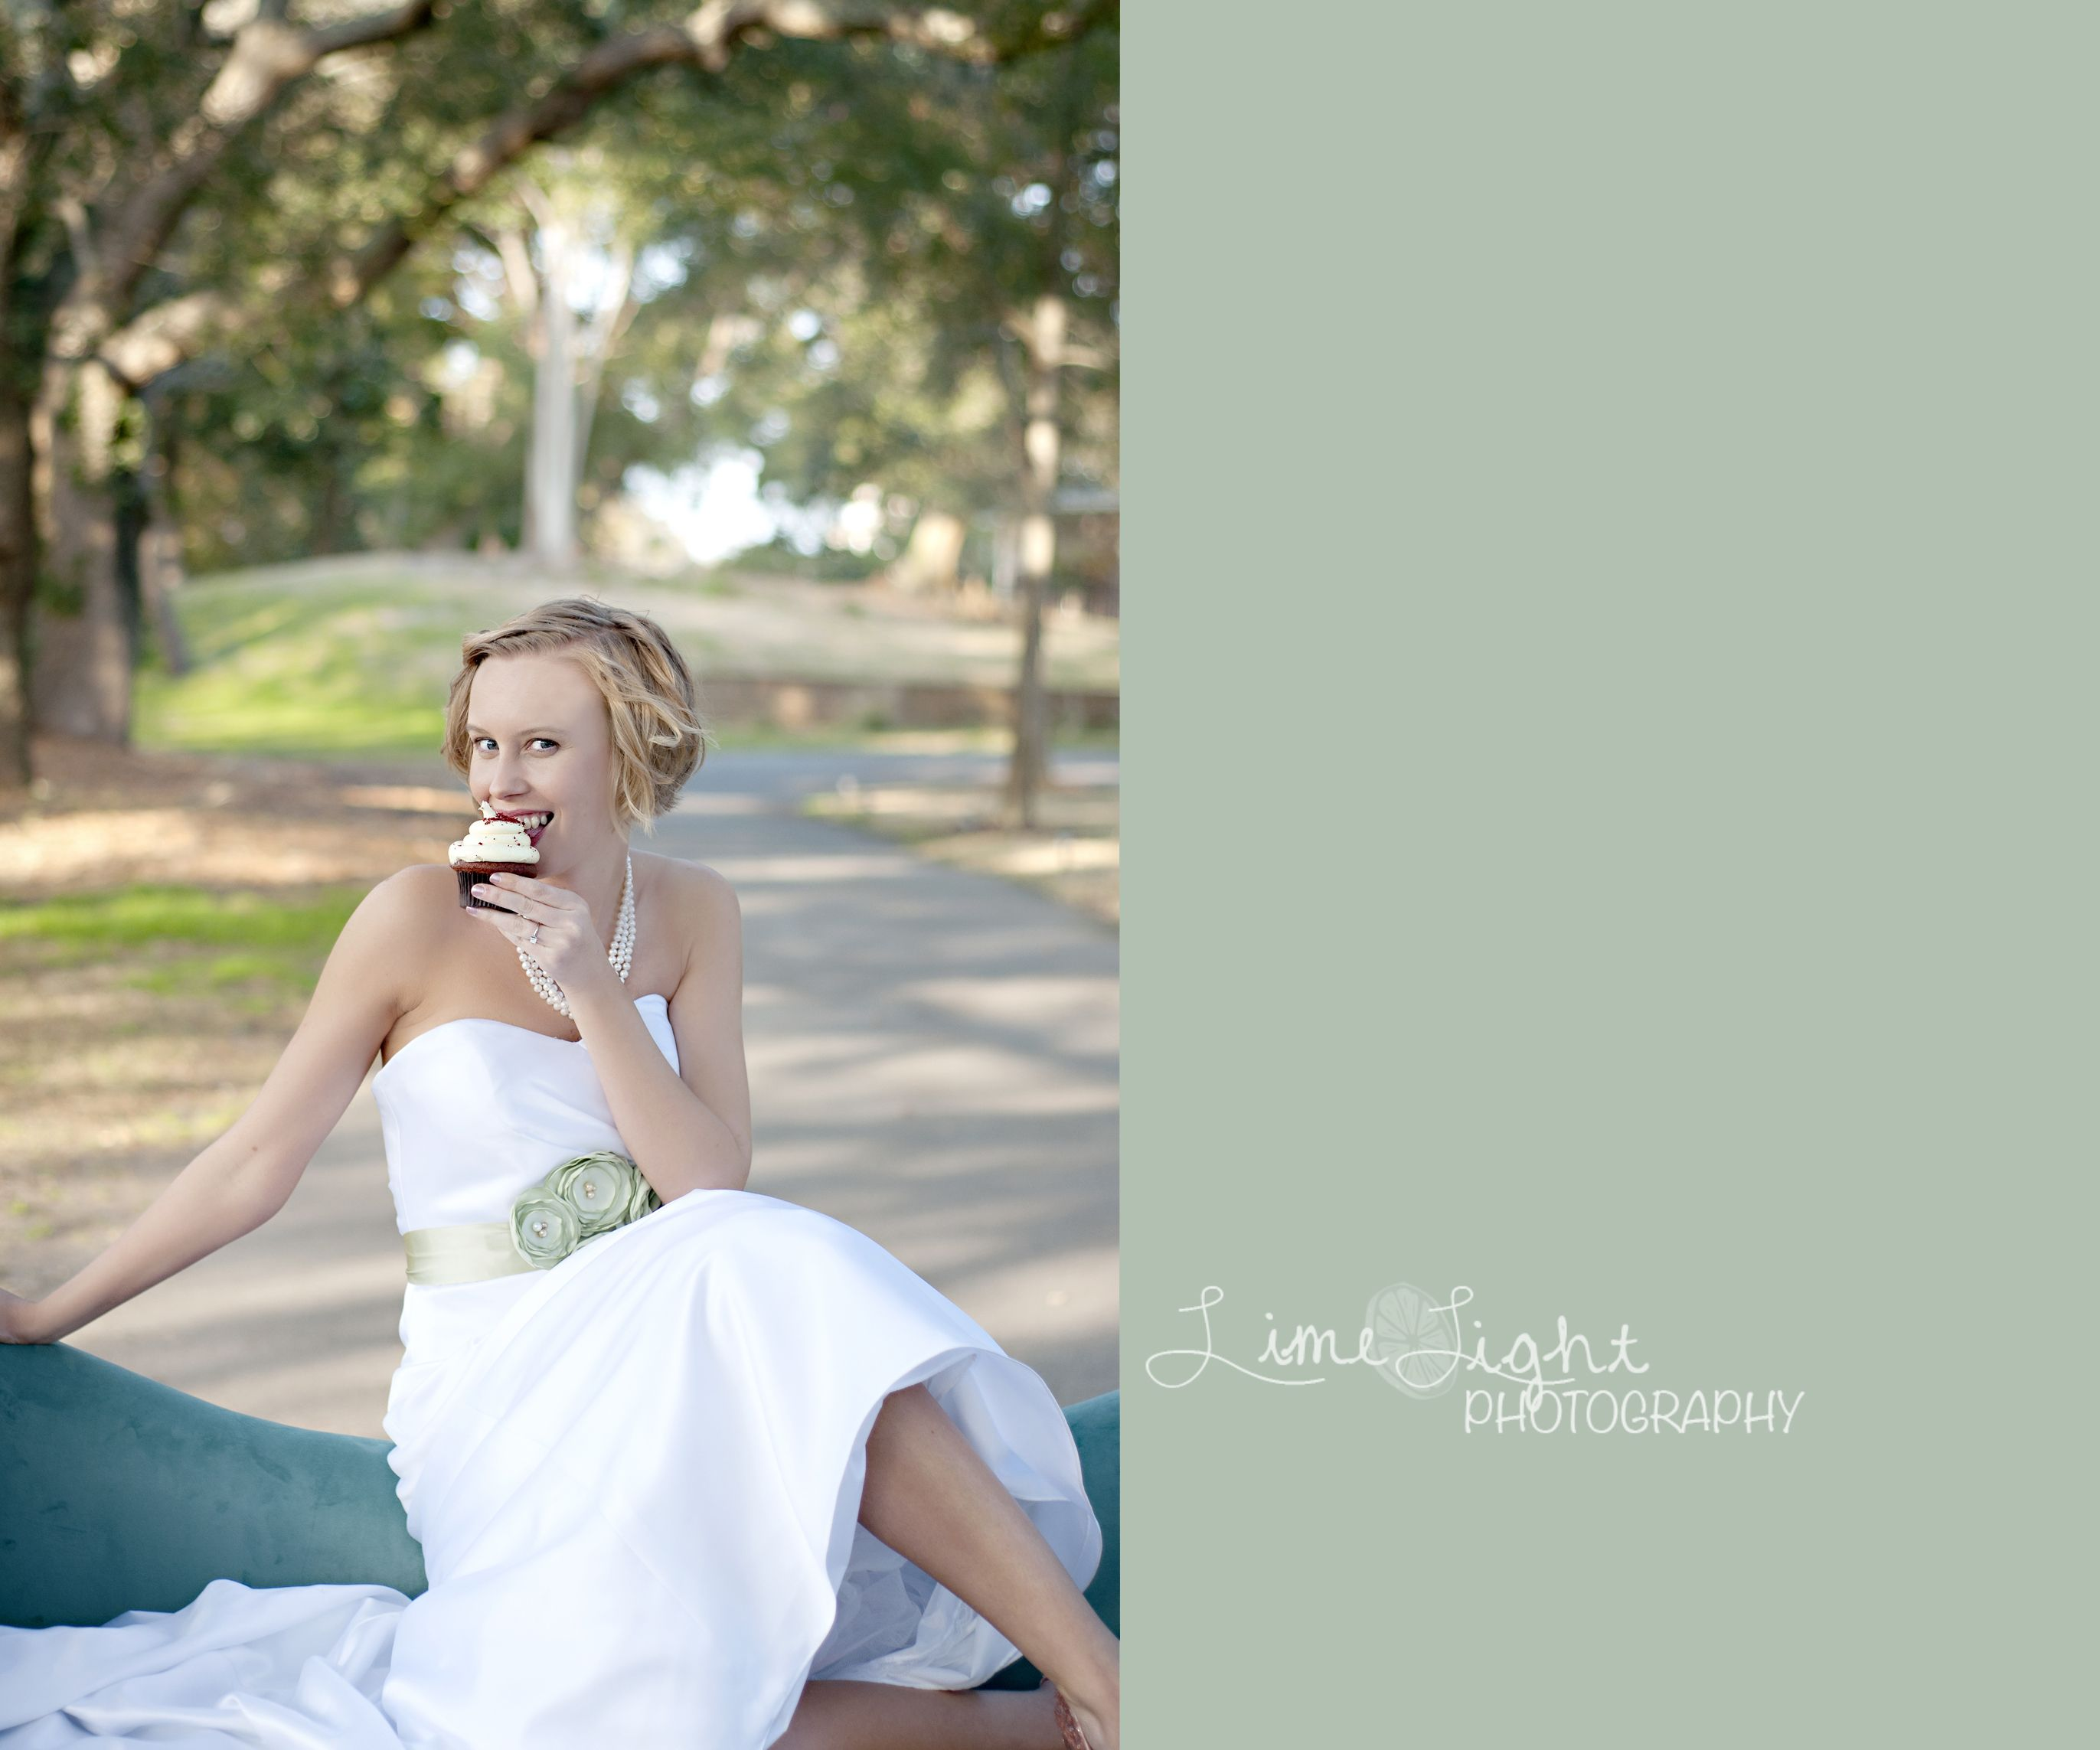 The lightbox wedding dresses  Cupcake Bride Outdoor bridal portrait Wedding Dress  Lime Light